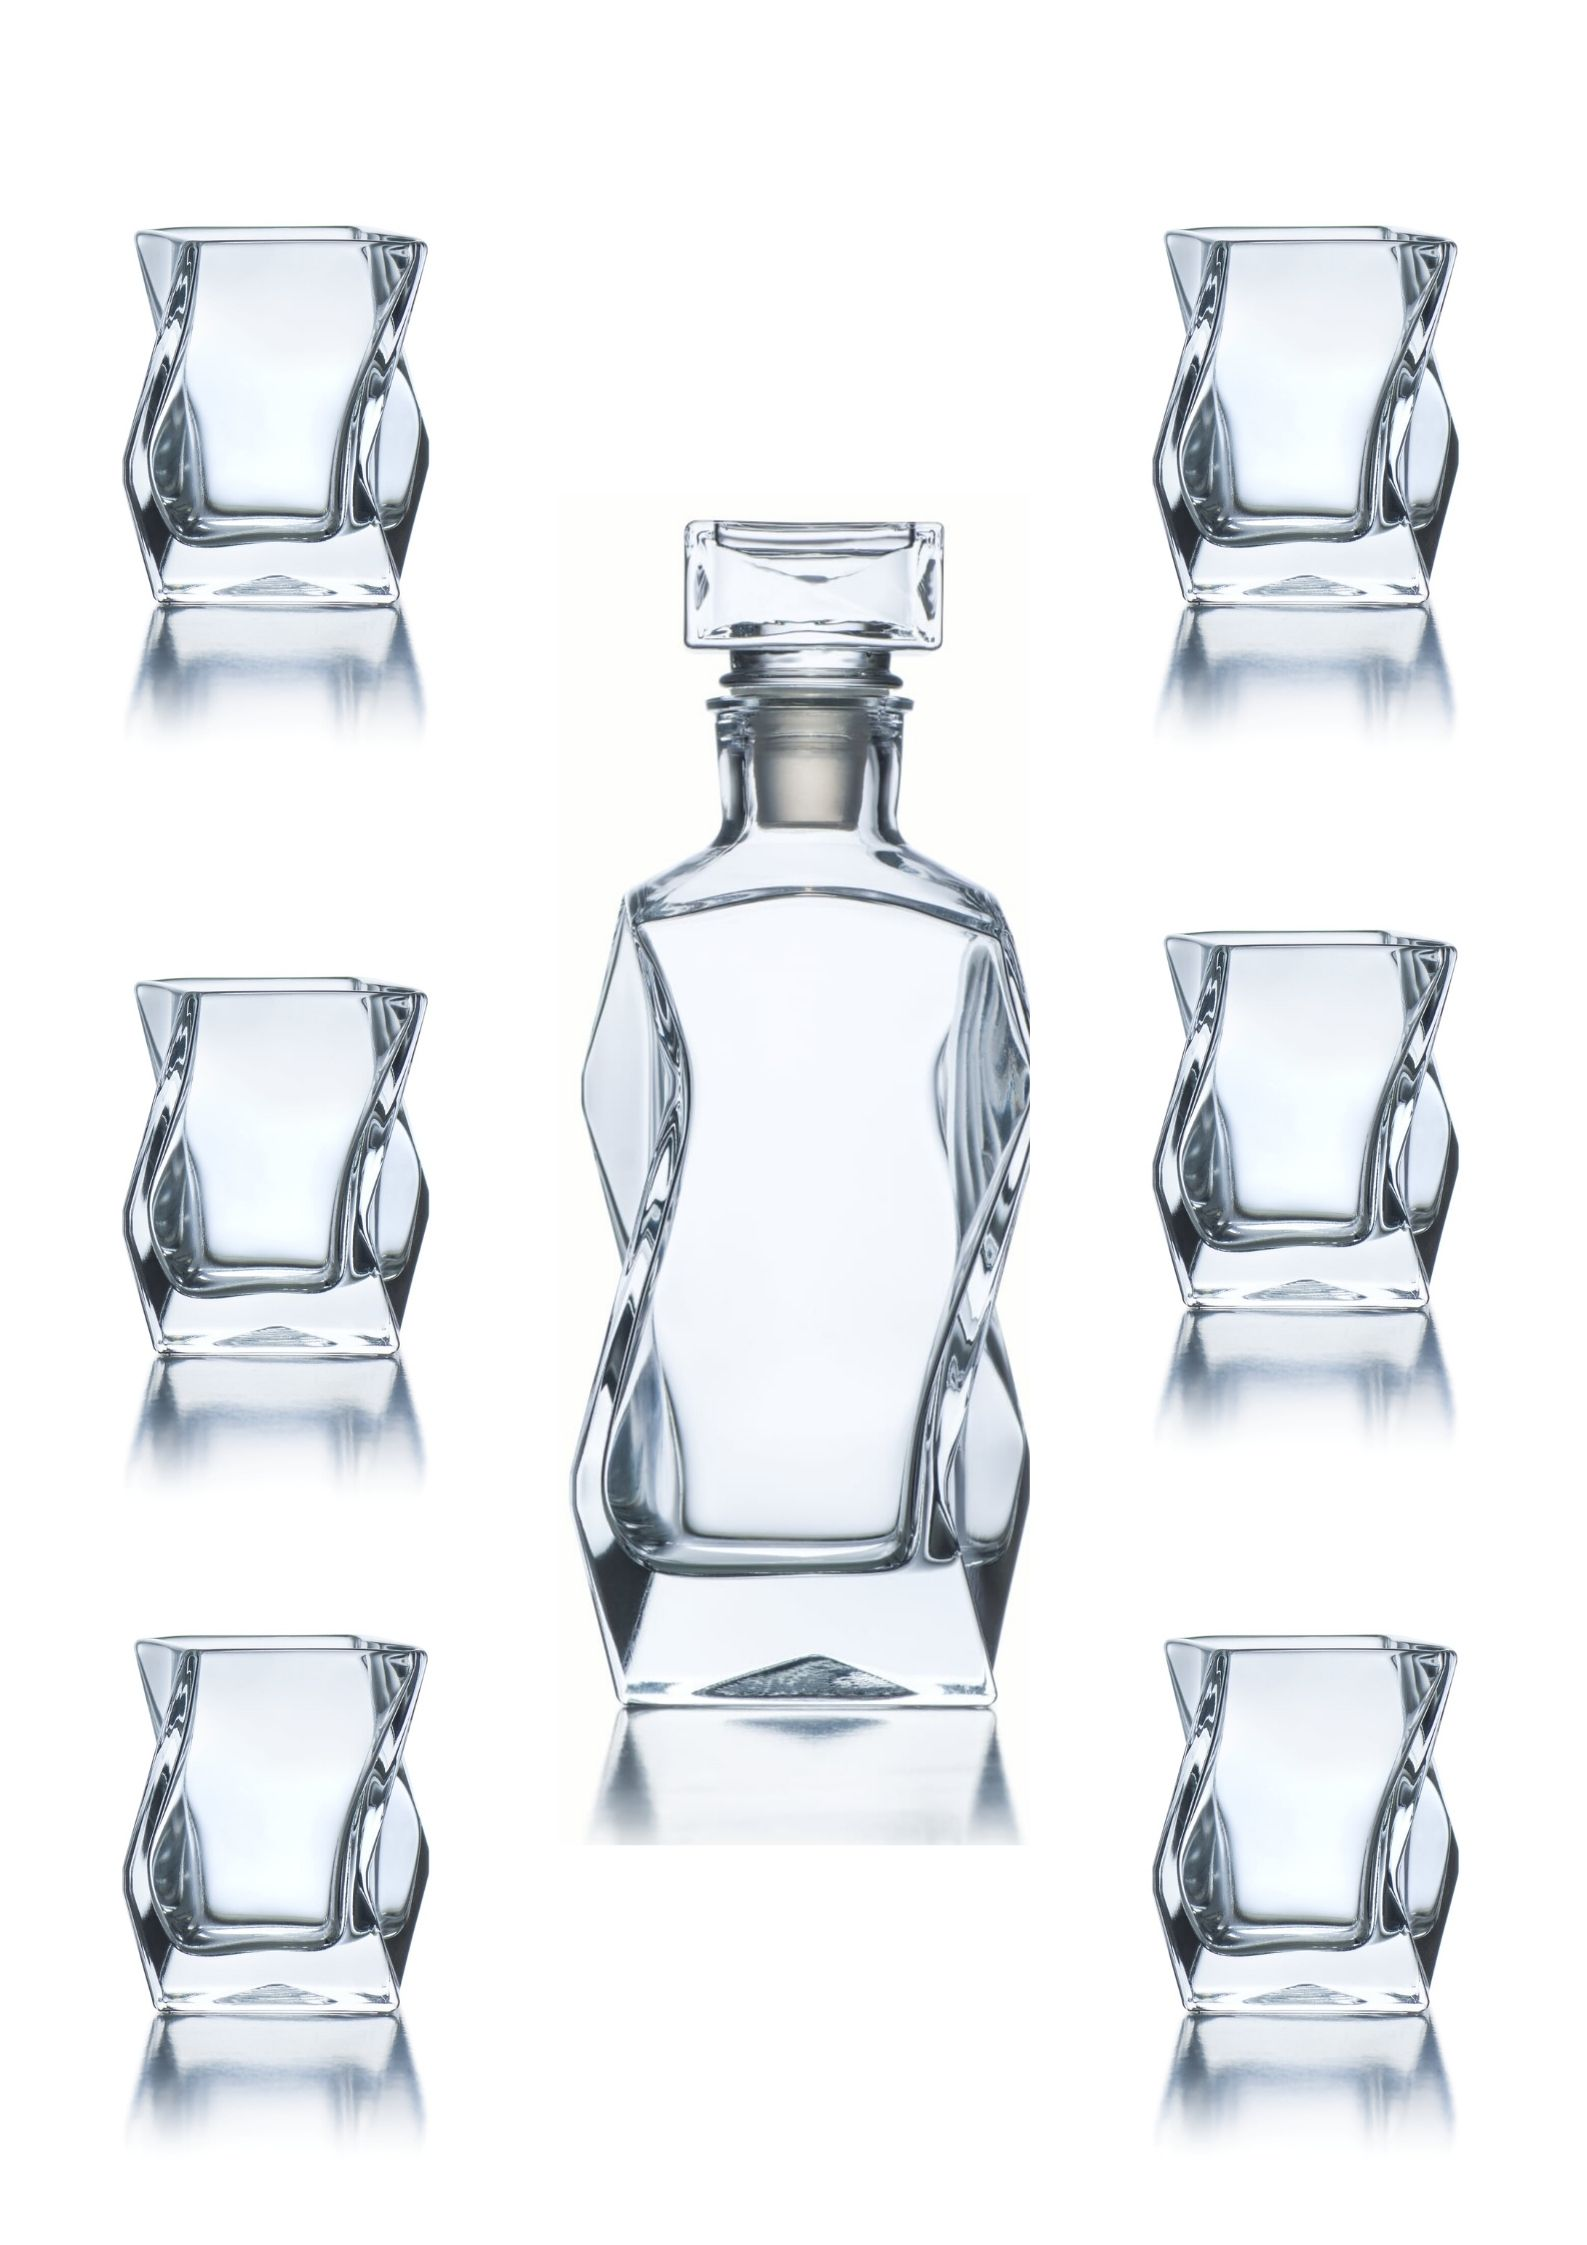 zestaw do whisky szklanki i karafka